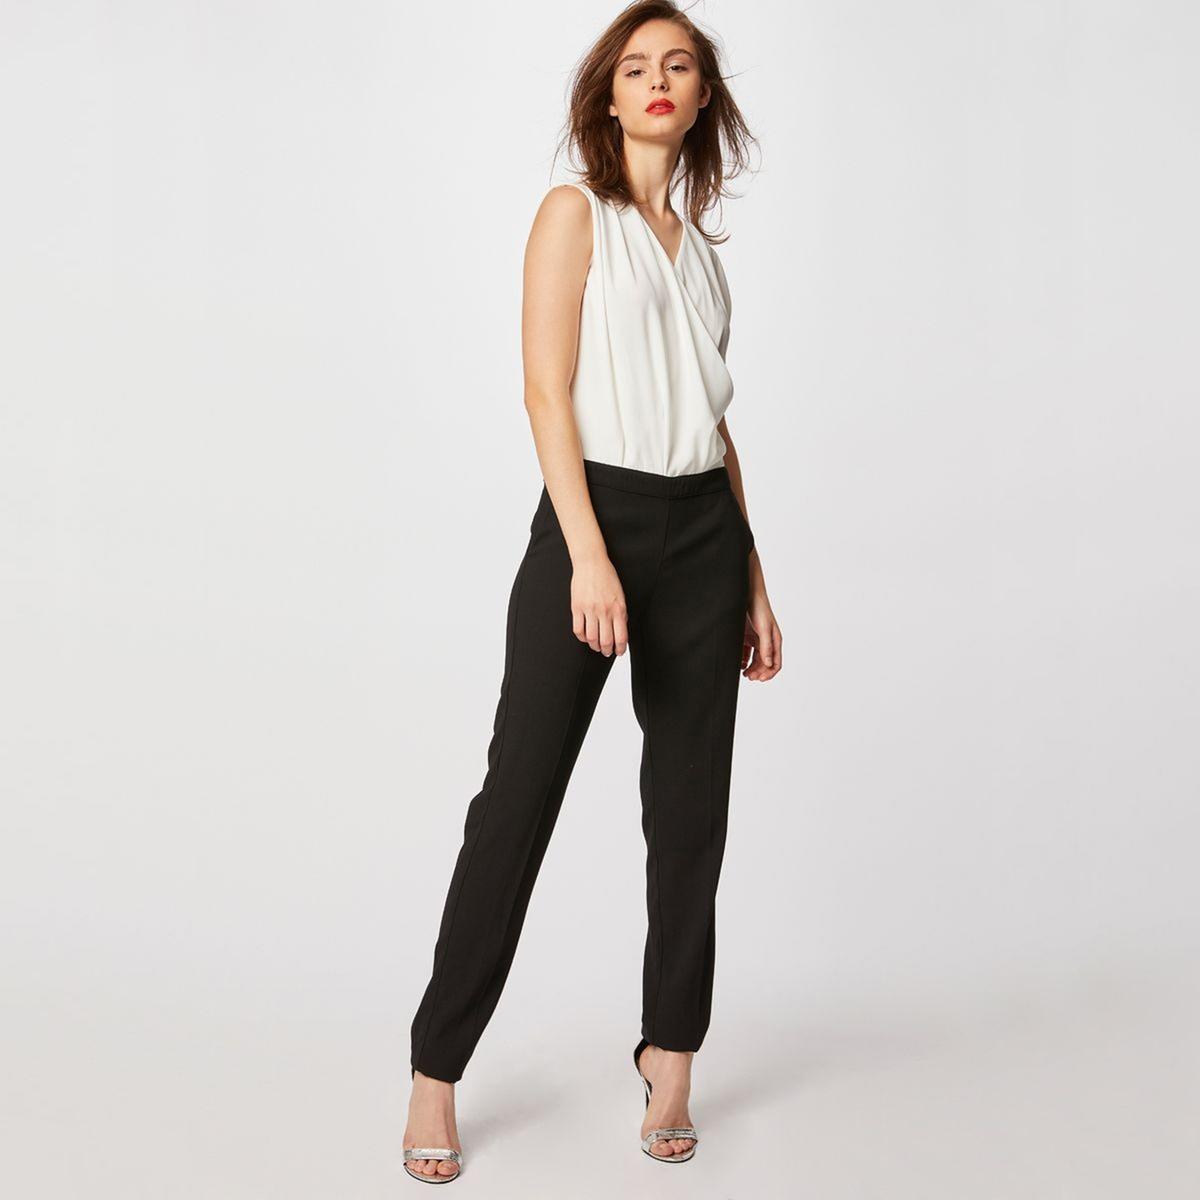 Комбинезон с брюками комбинезон с брюками с рисунком